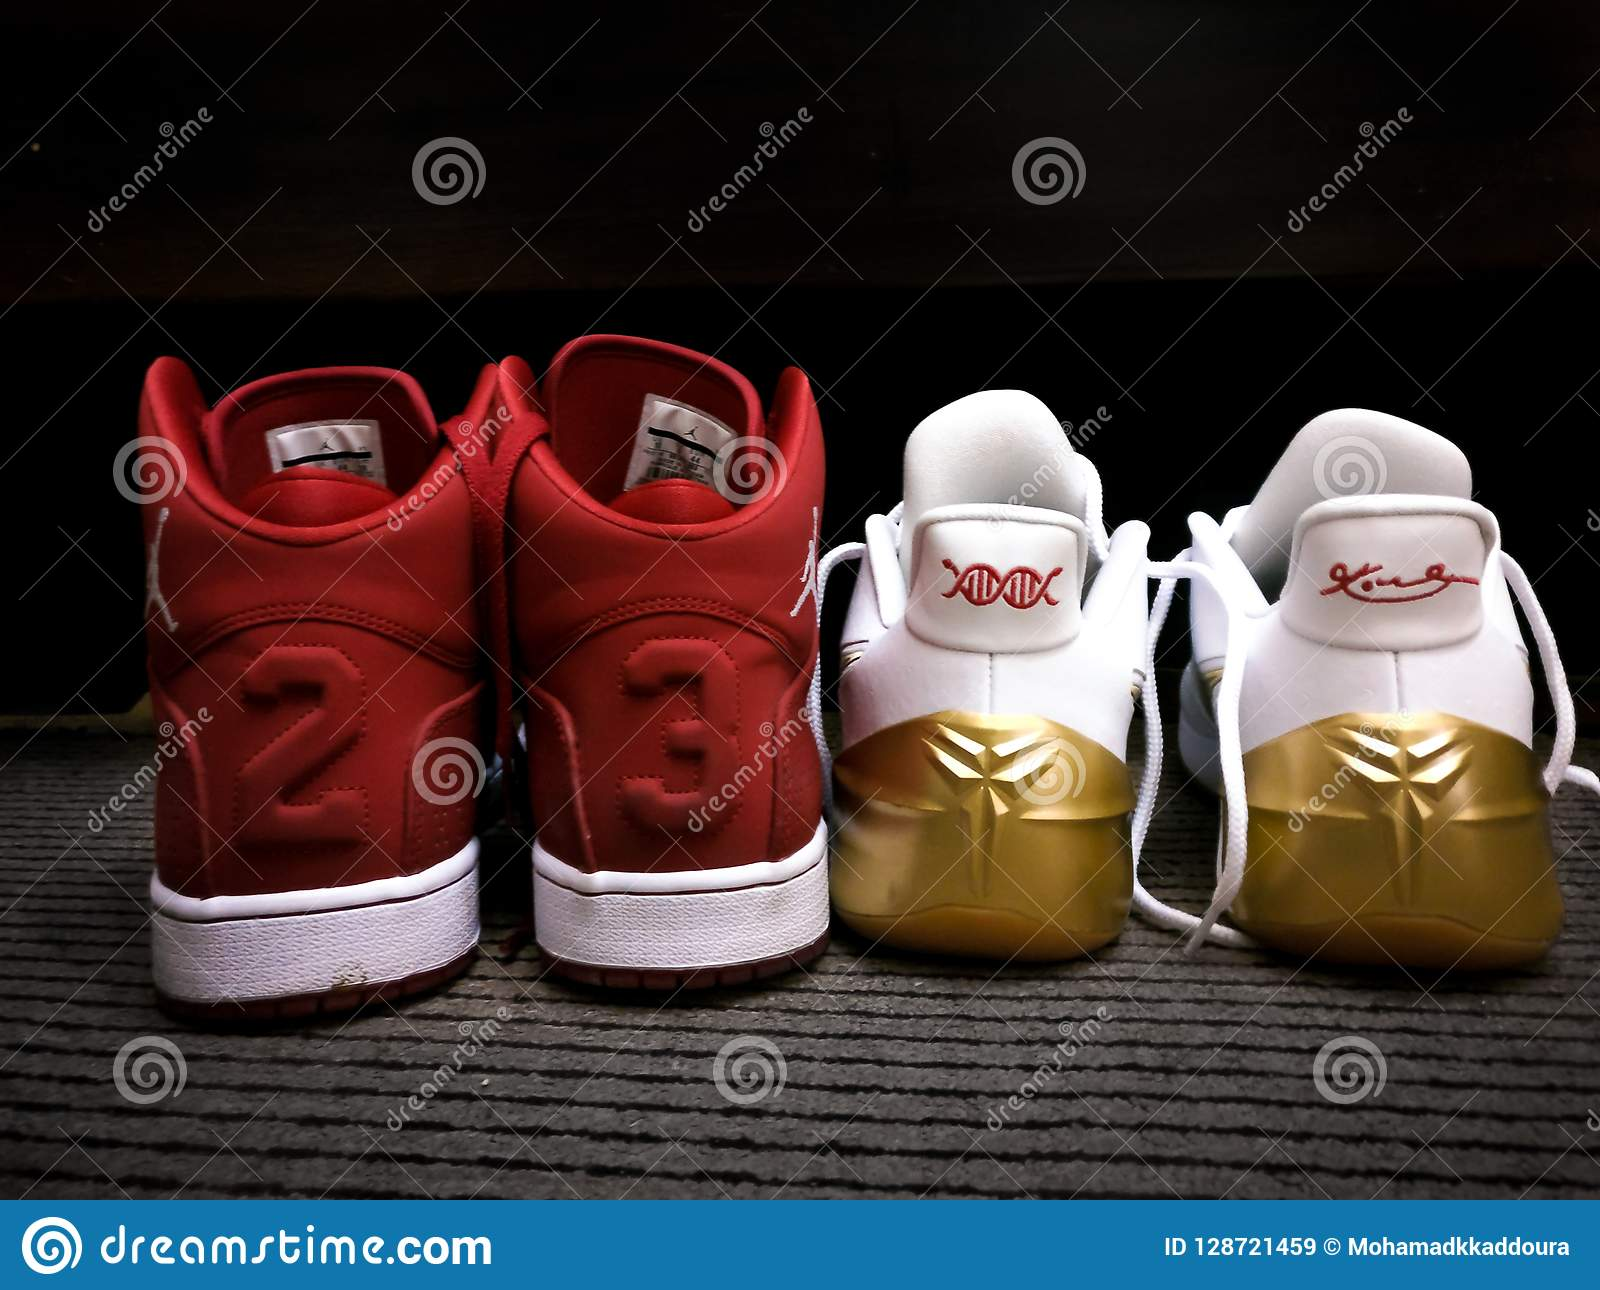 jordan blanche michael jordan michael blanche chaussure 23 chaussure jLzGqSpMVU